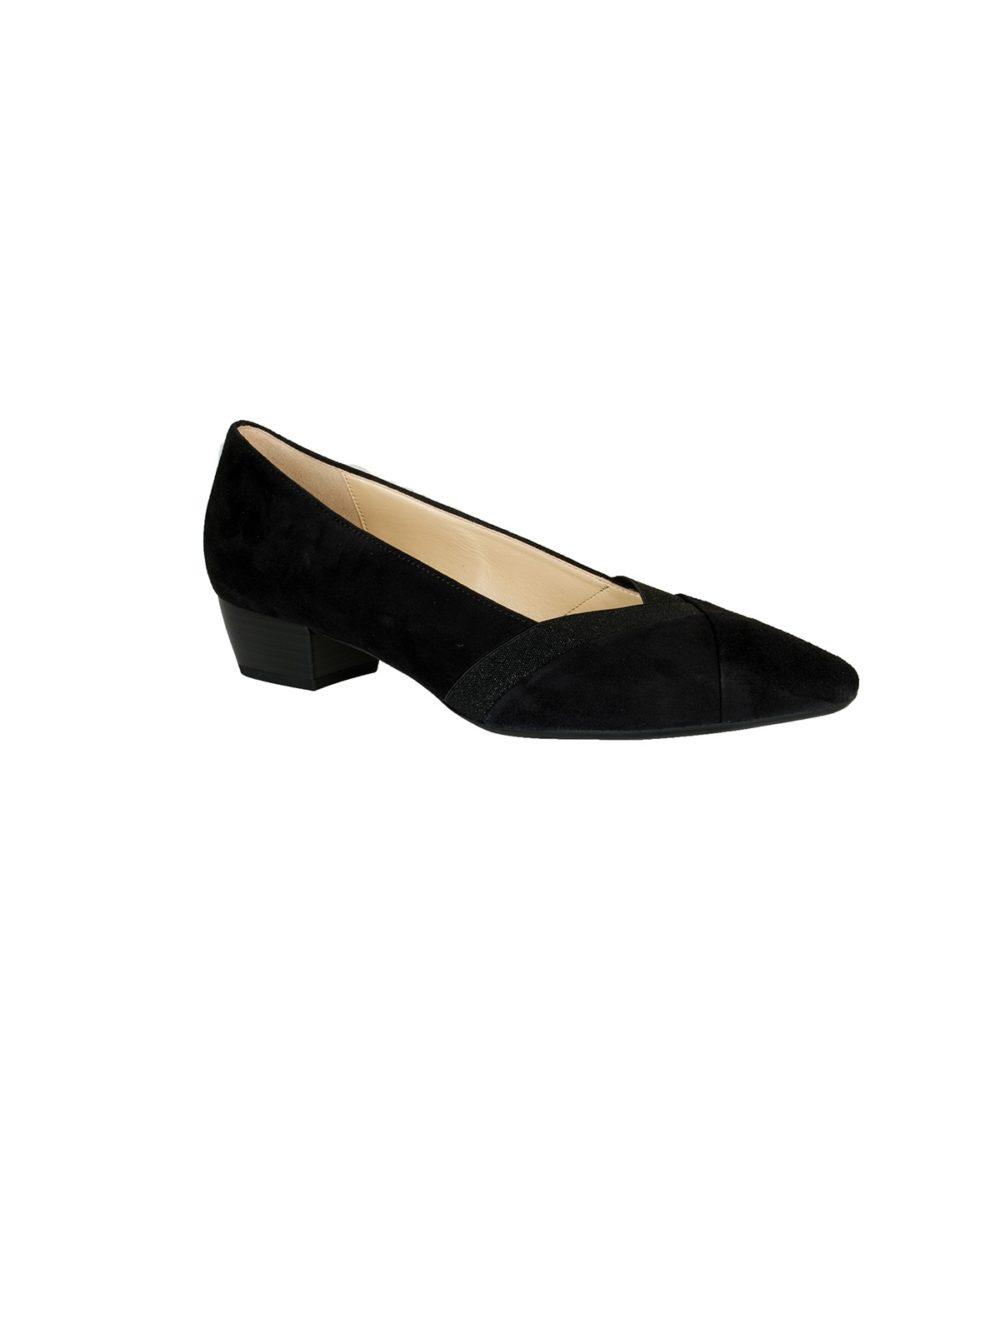 GB191 Opera Shoe Black